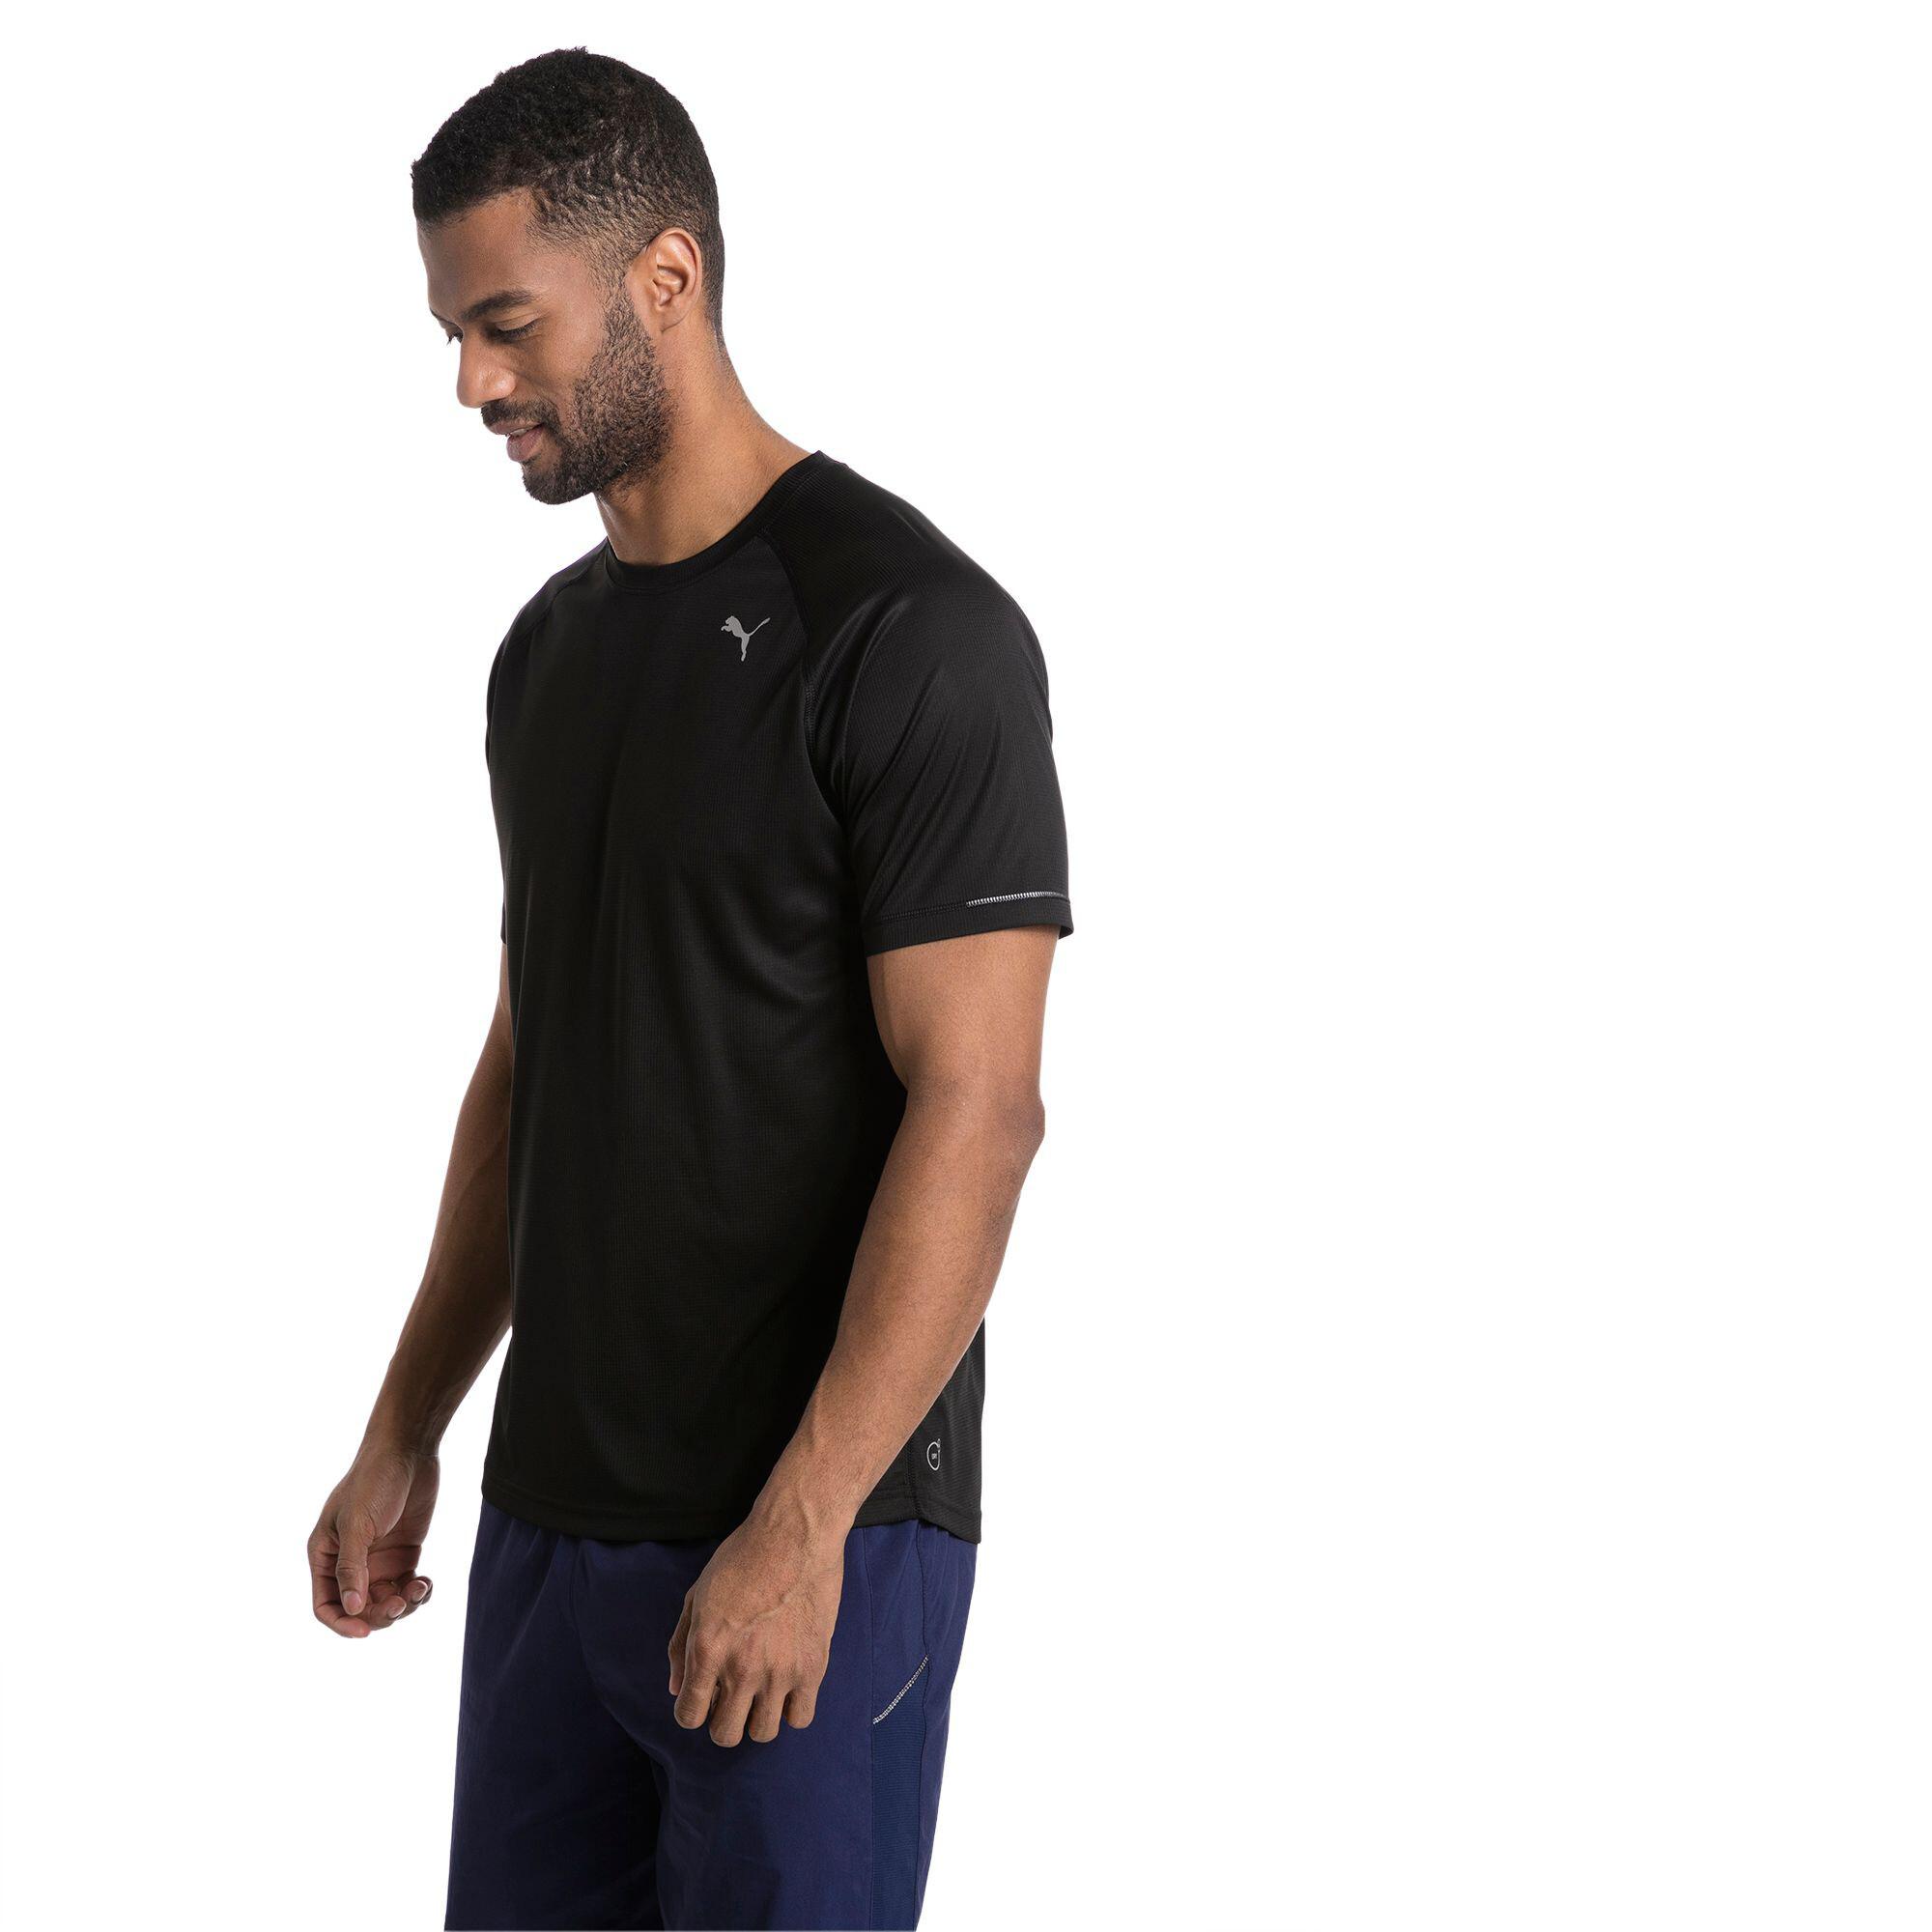 Indexbild 4 - PUMA Running Herren T-Shirt Männer T-Shirt Laufen Neu